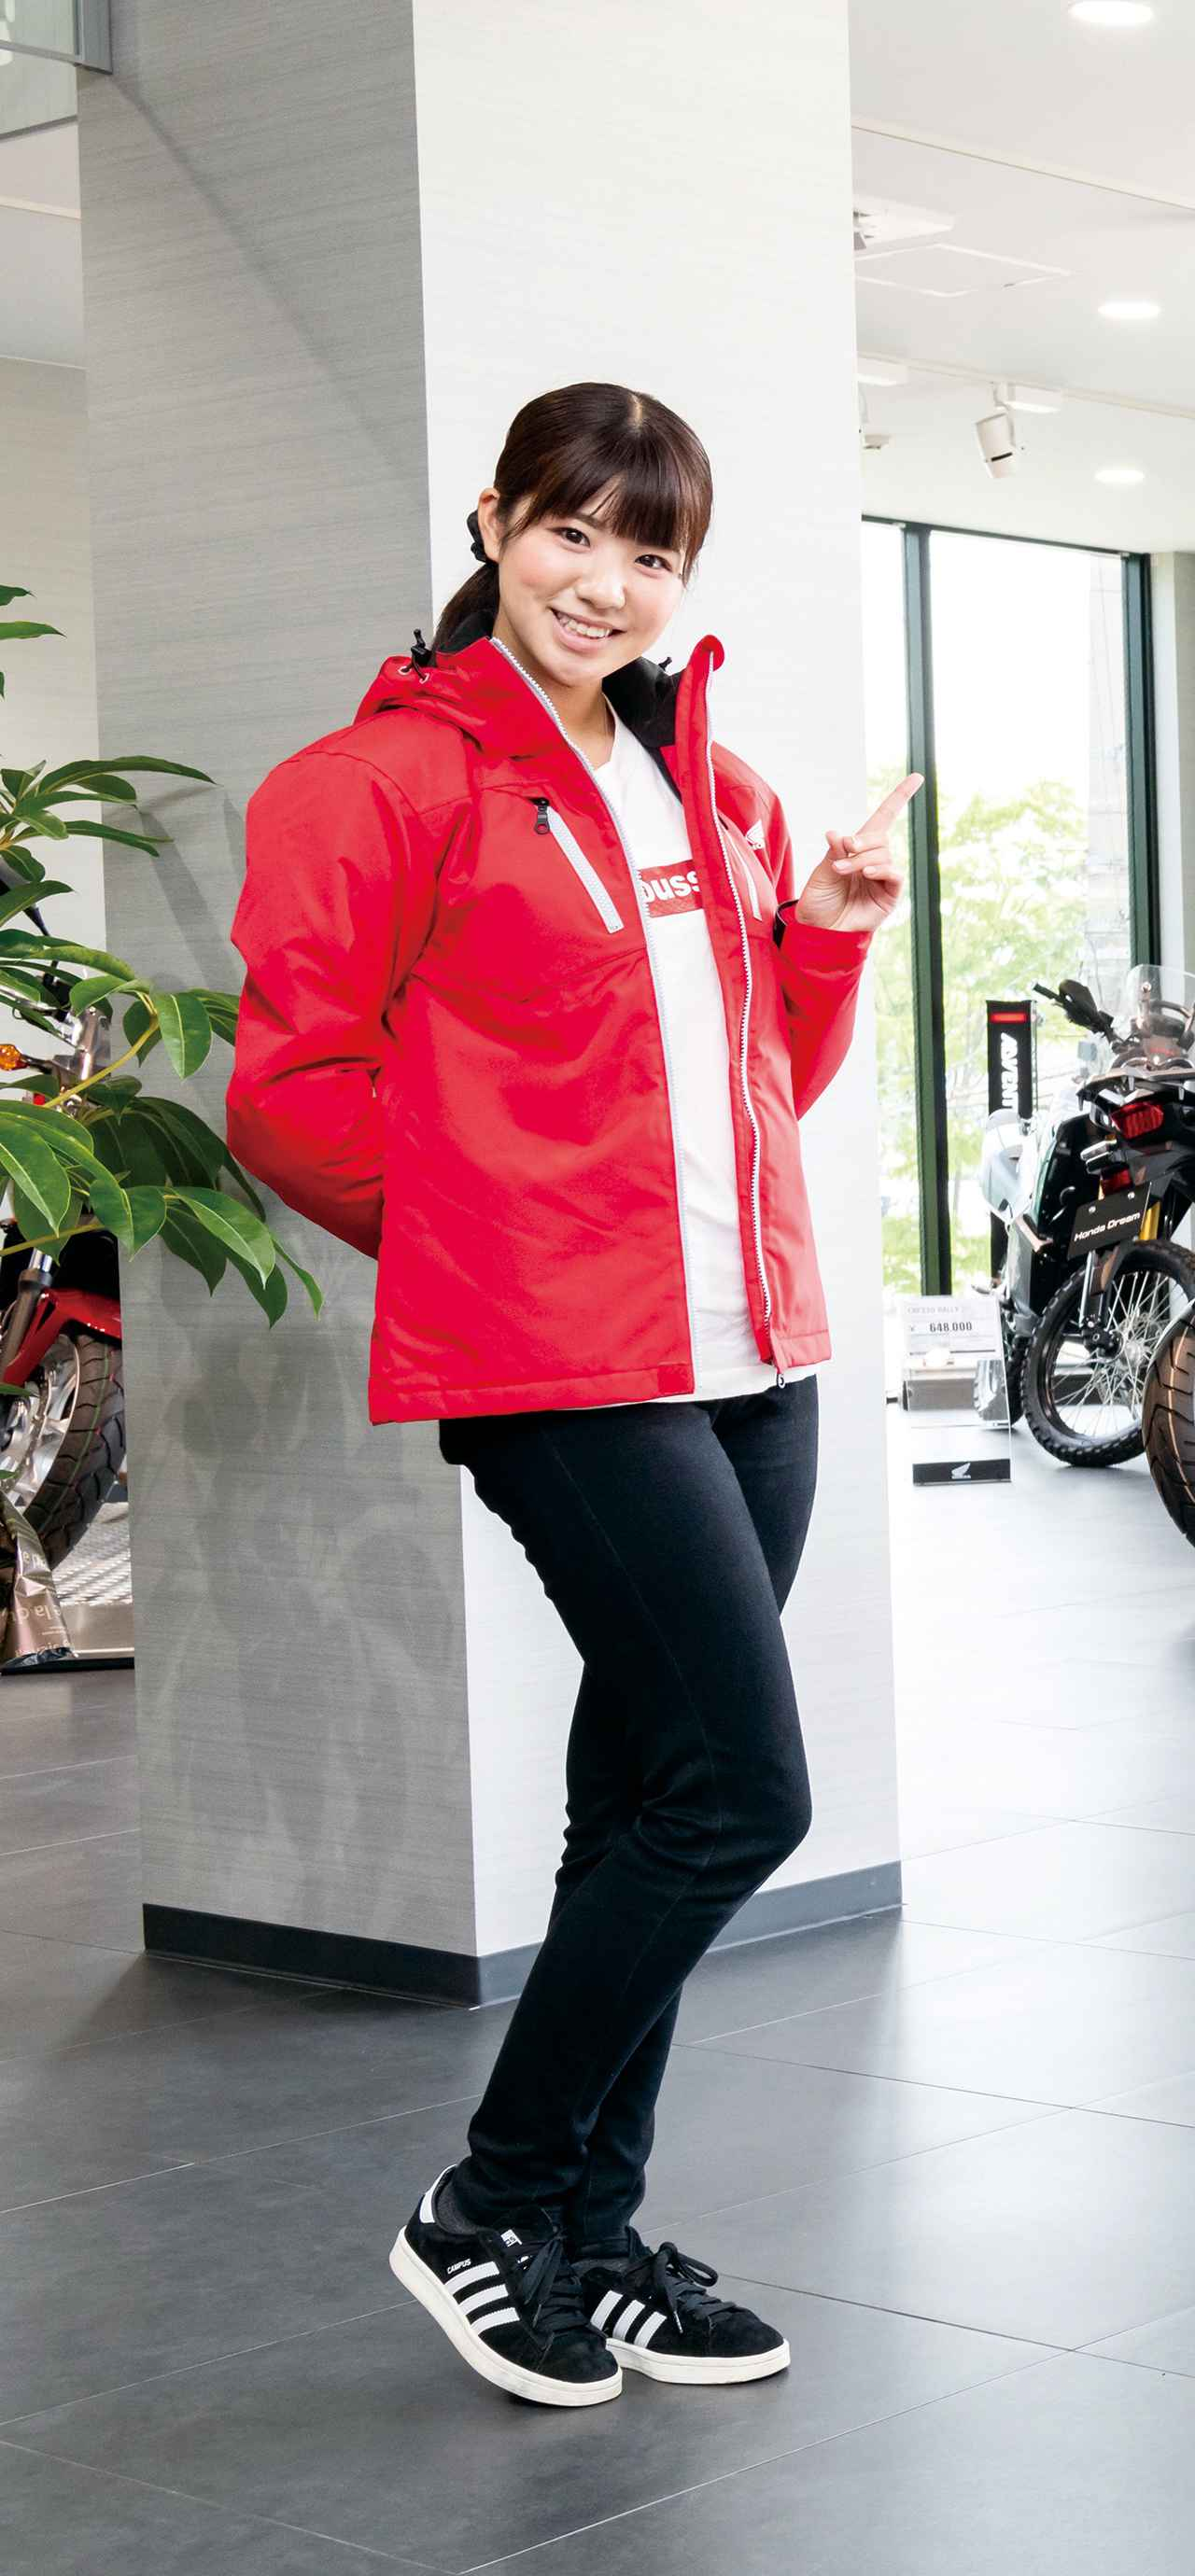 Images : 8番目の画像 - Honda Dream 仙台六丁の目 - webオートバイ